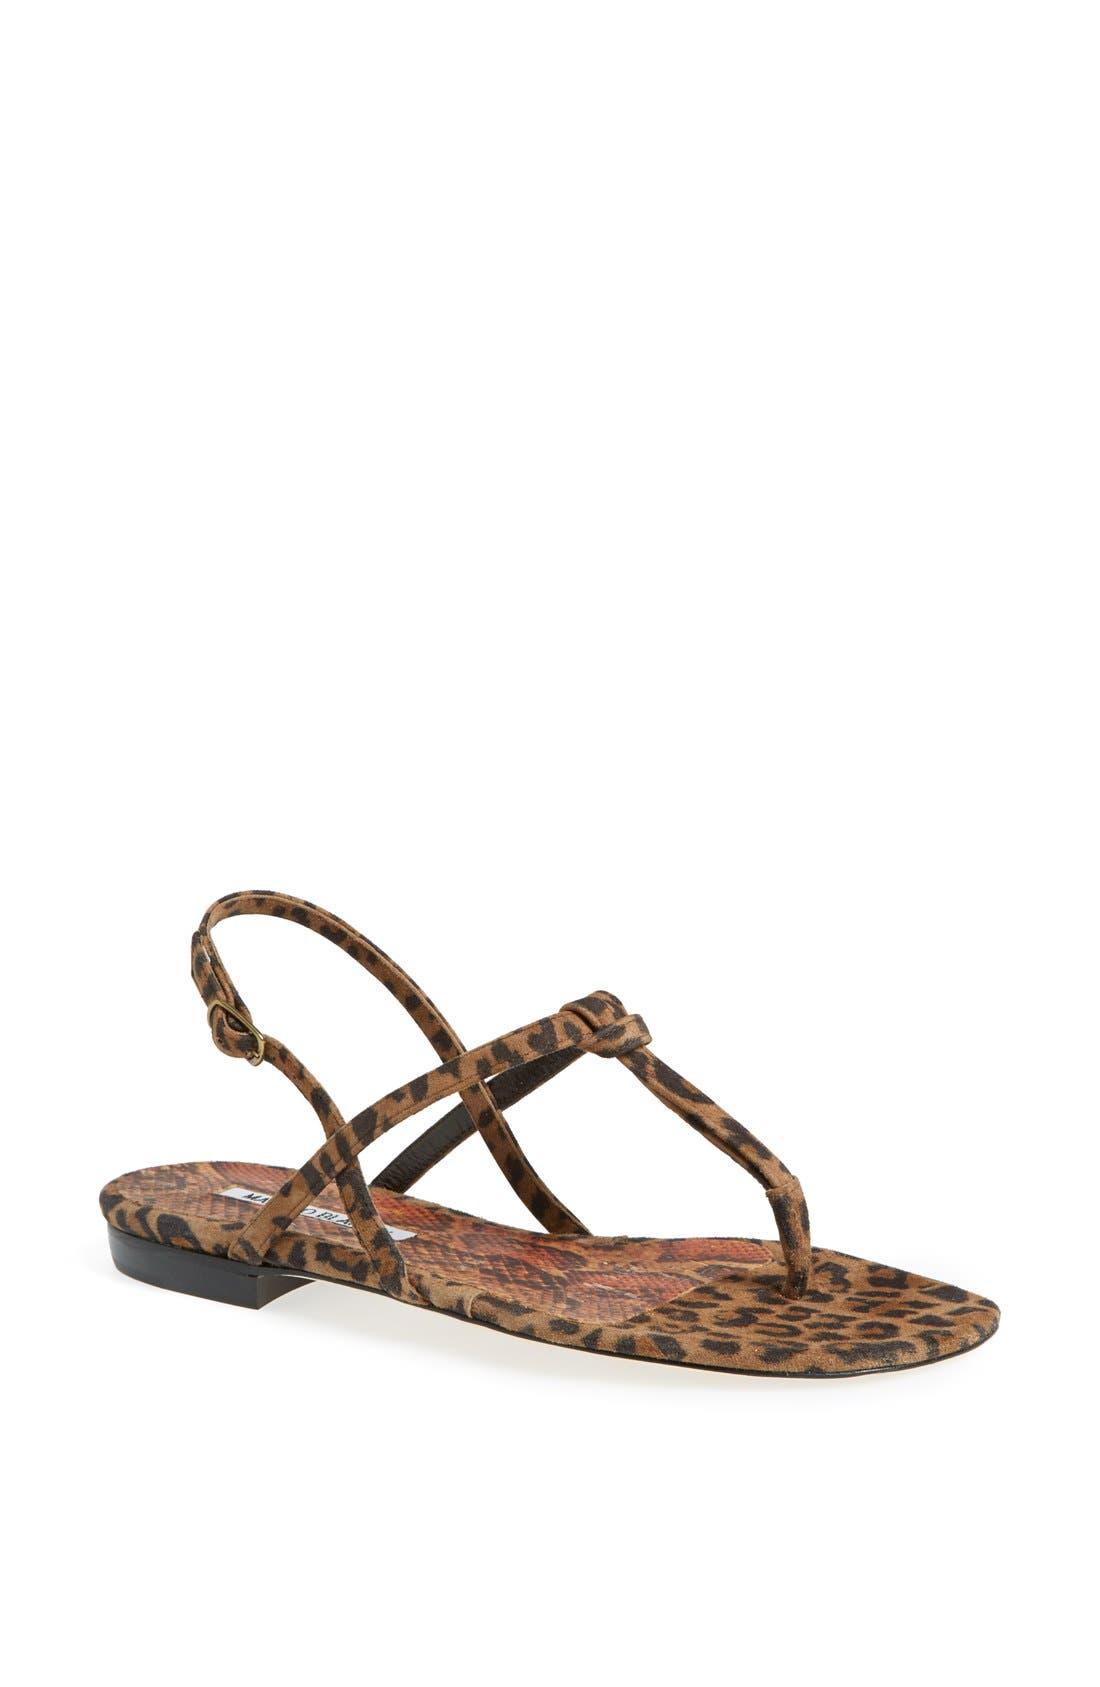 Alternate Image 1 Selected - Manolo Blahnik 'Valig' Sandal